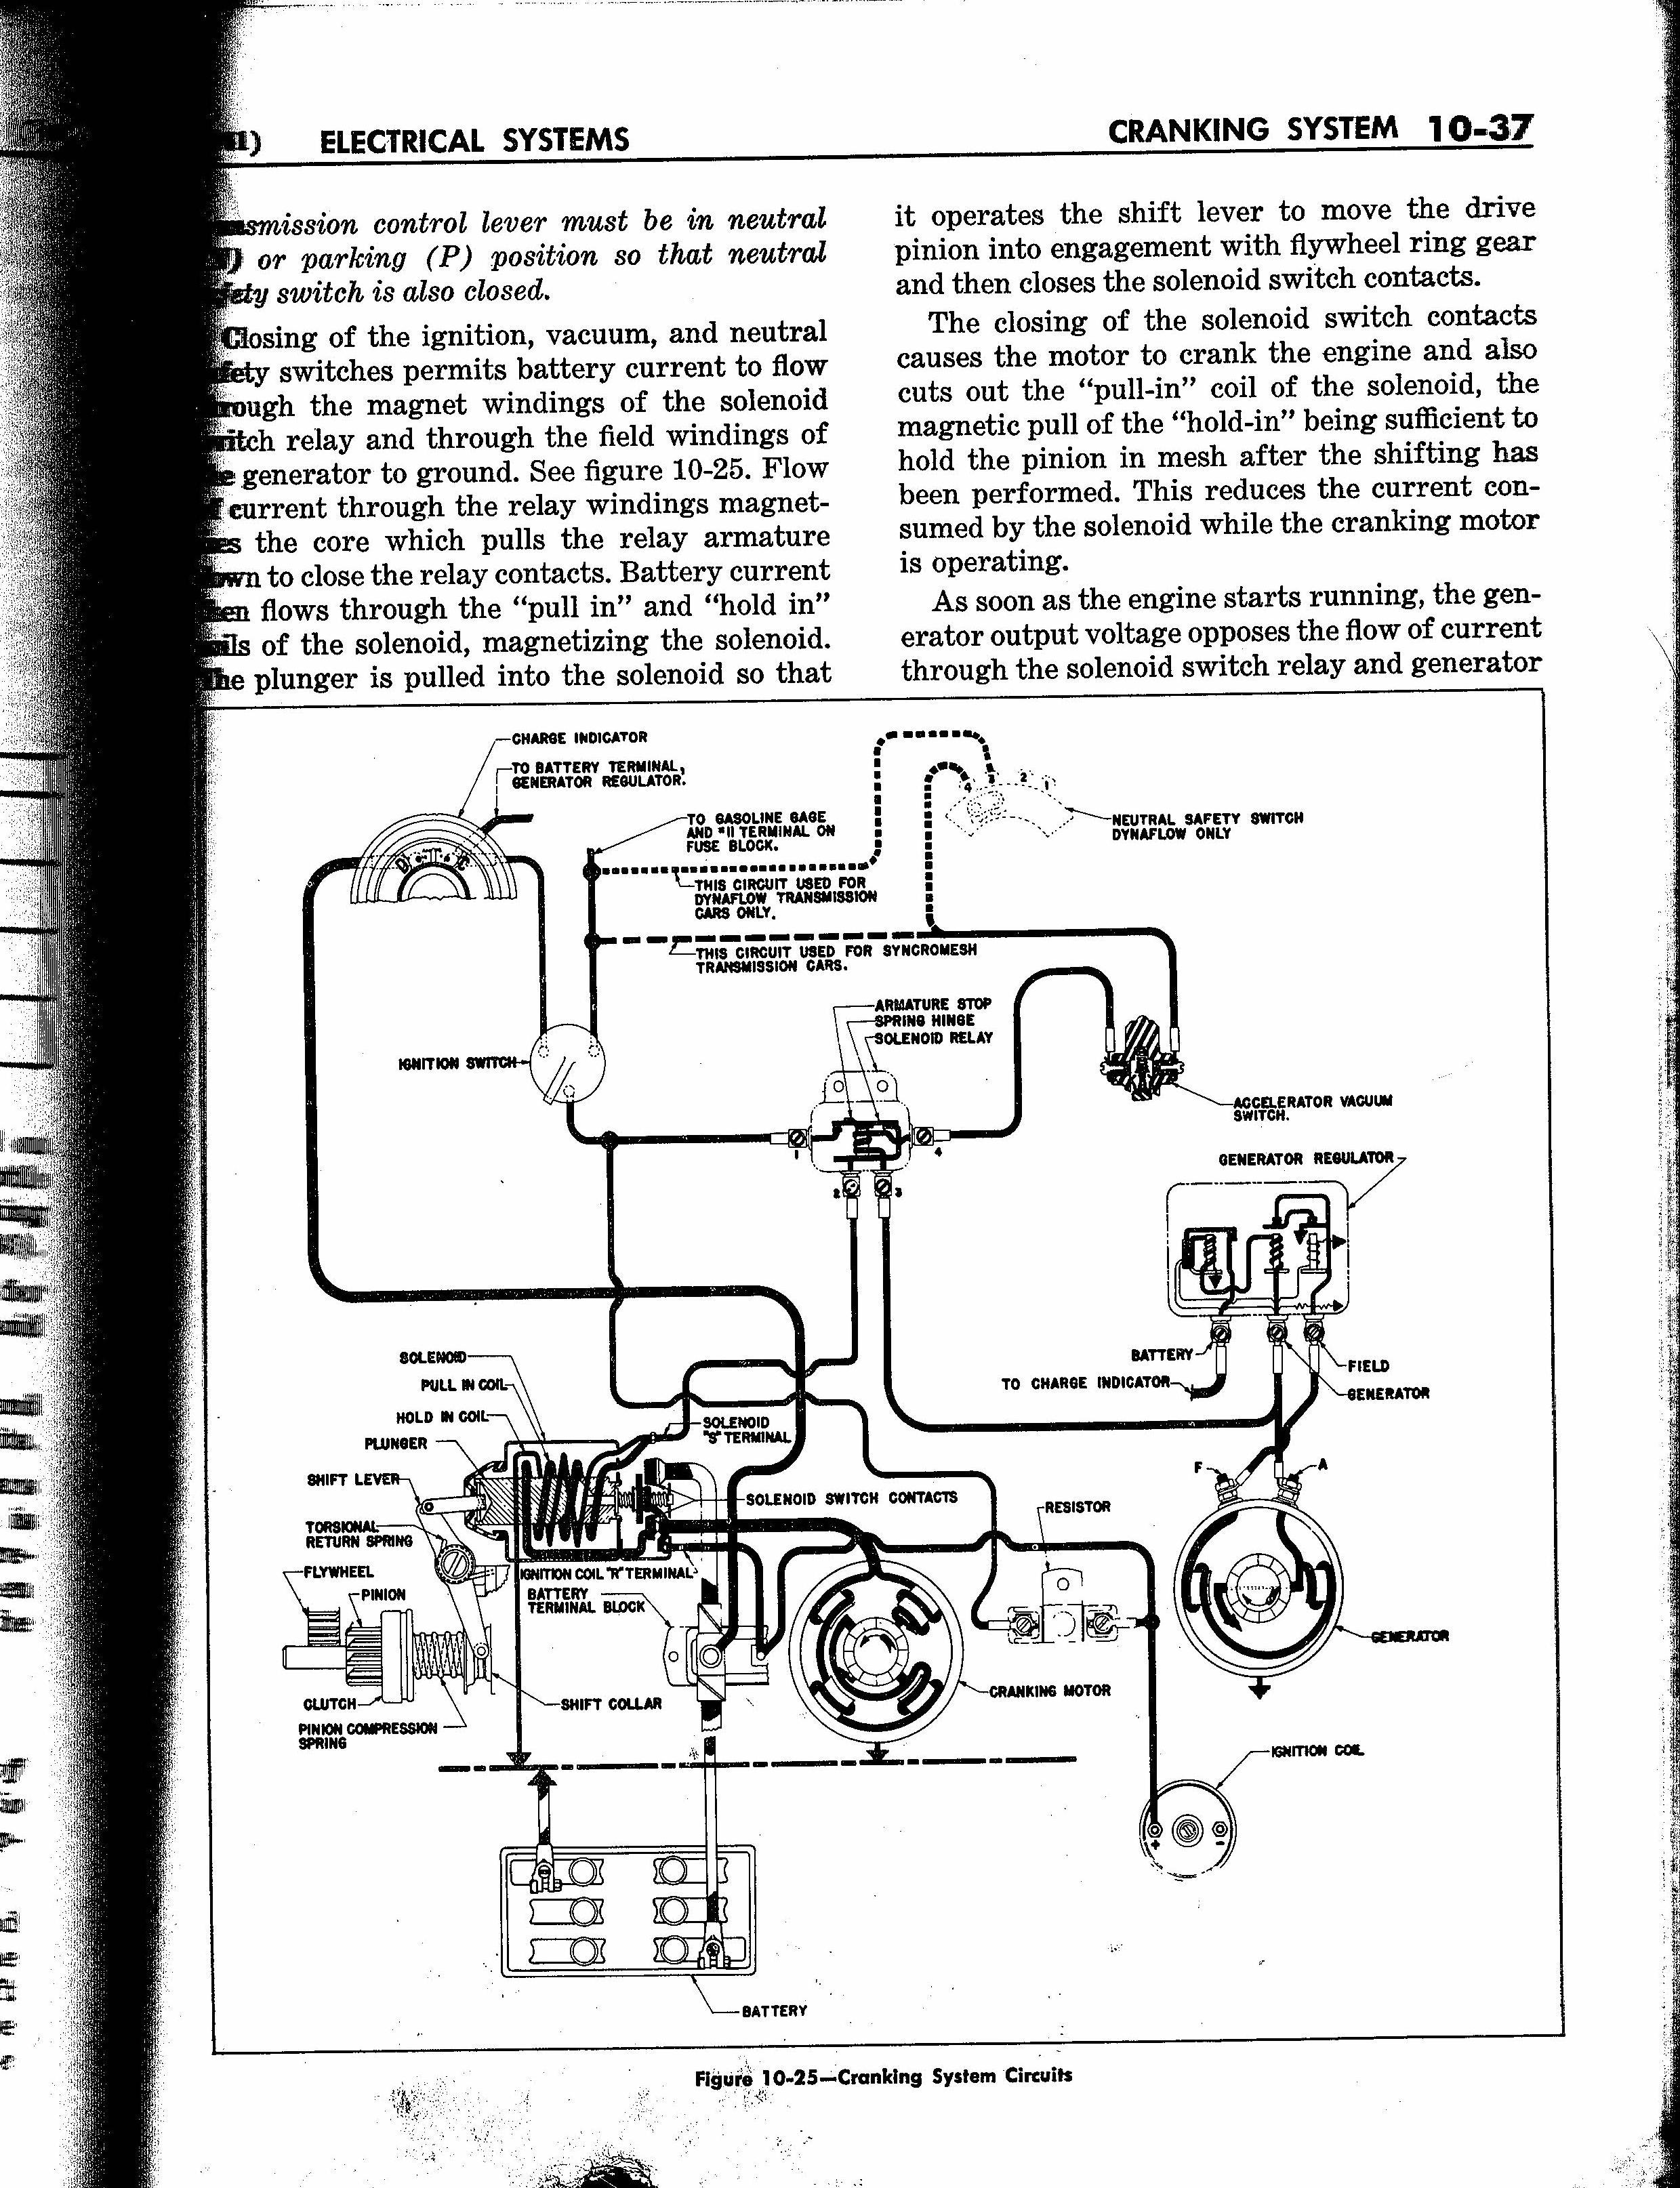 1940 buick wiring diagram - wiring diagram schema quit-head-a -  quit-head-a.atmosphereconcept.it  atmosphereconcept.it